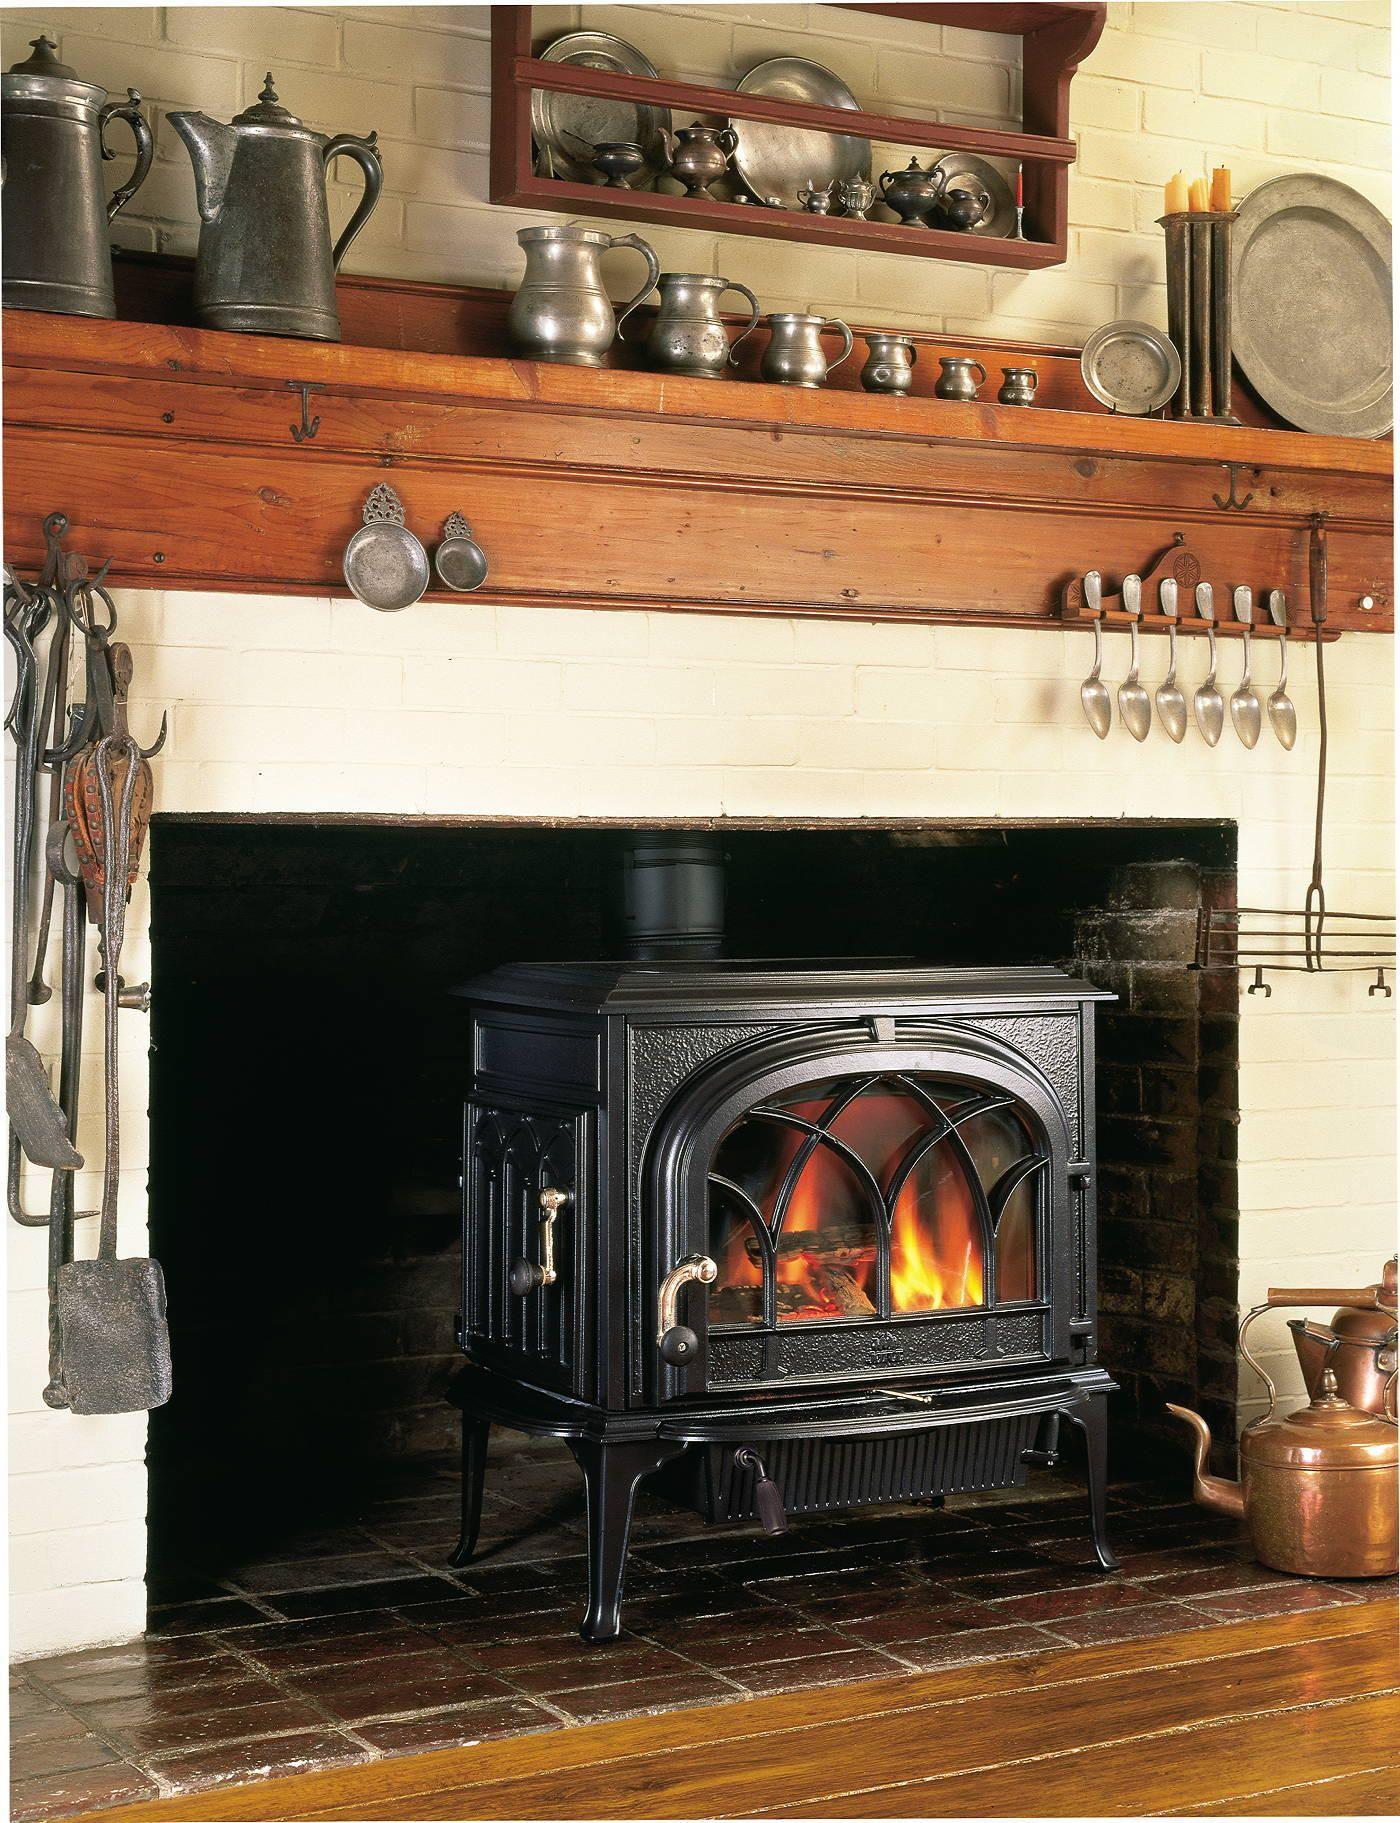 B Jotul B F500 Wood Stove Wood Stove Wall Wood Stove Fireplace